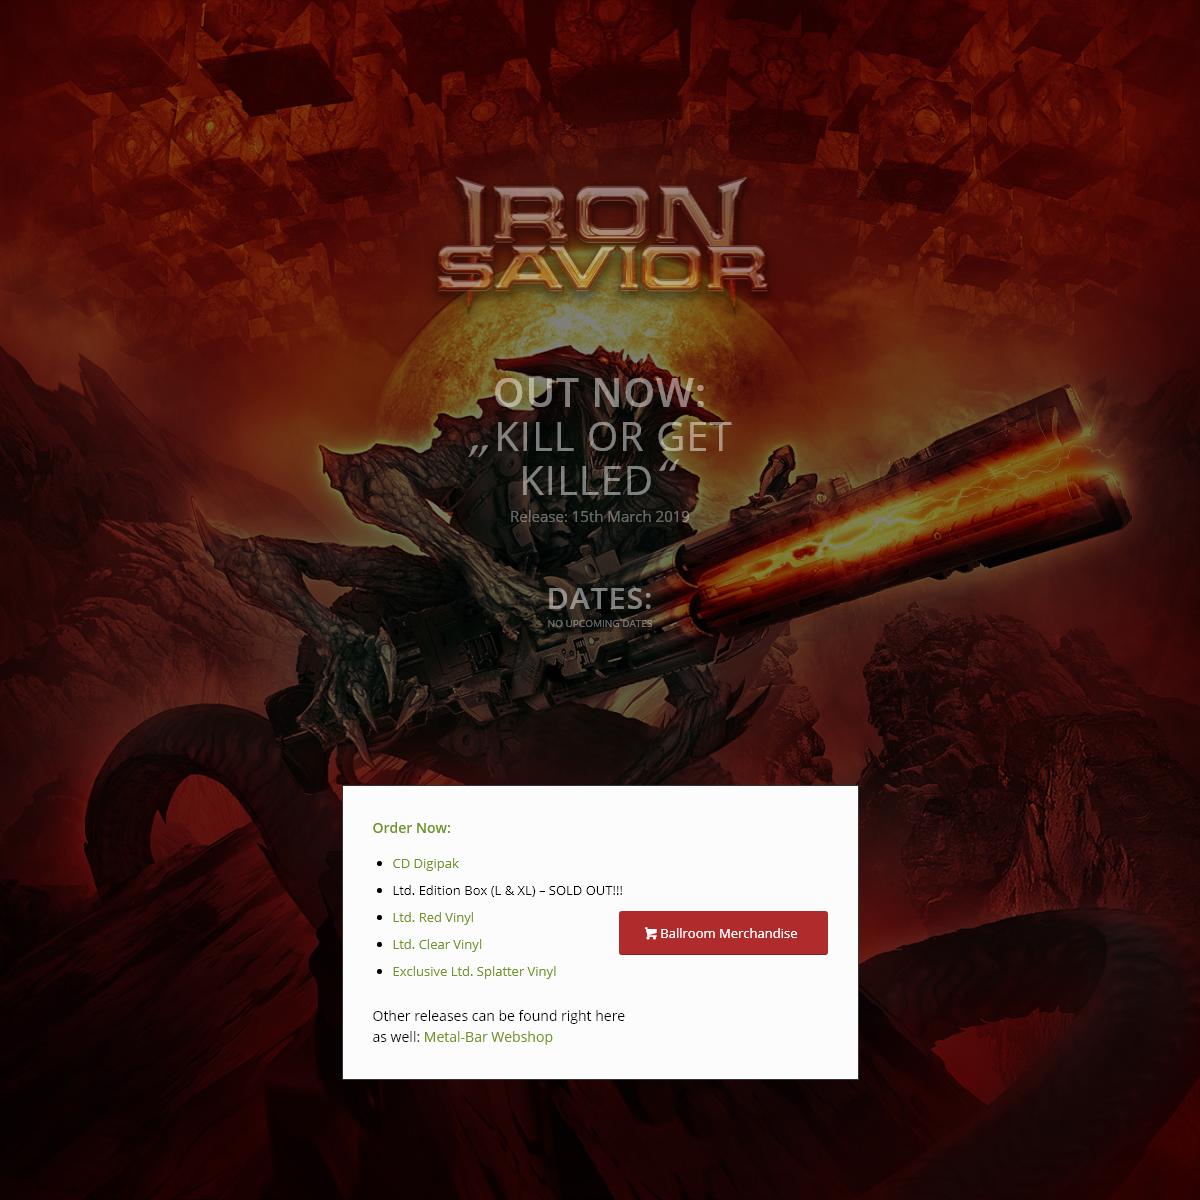 killer.iron-savior.com – Kill Or Get Killed